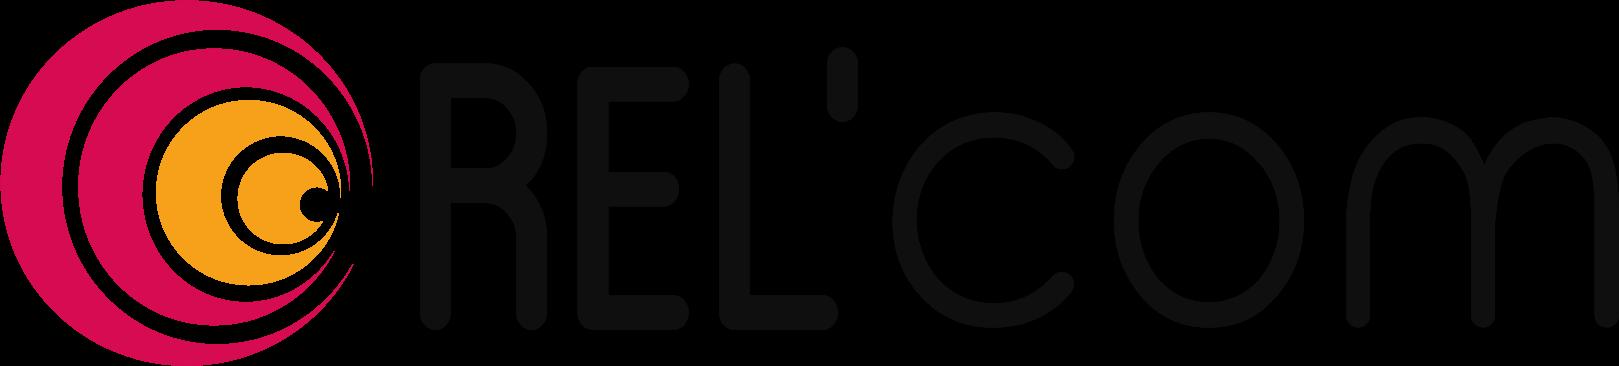 Logo DG Services